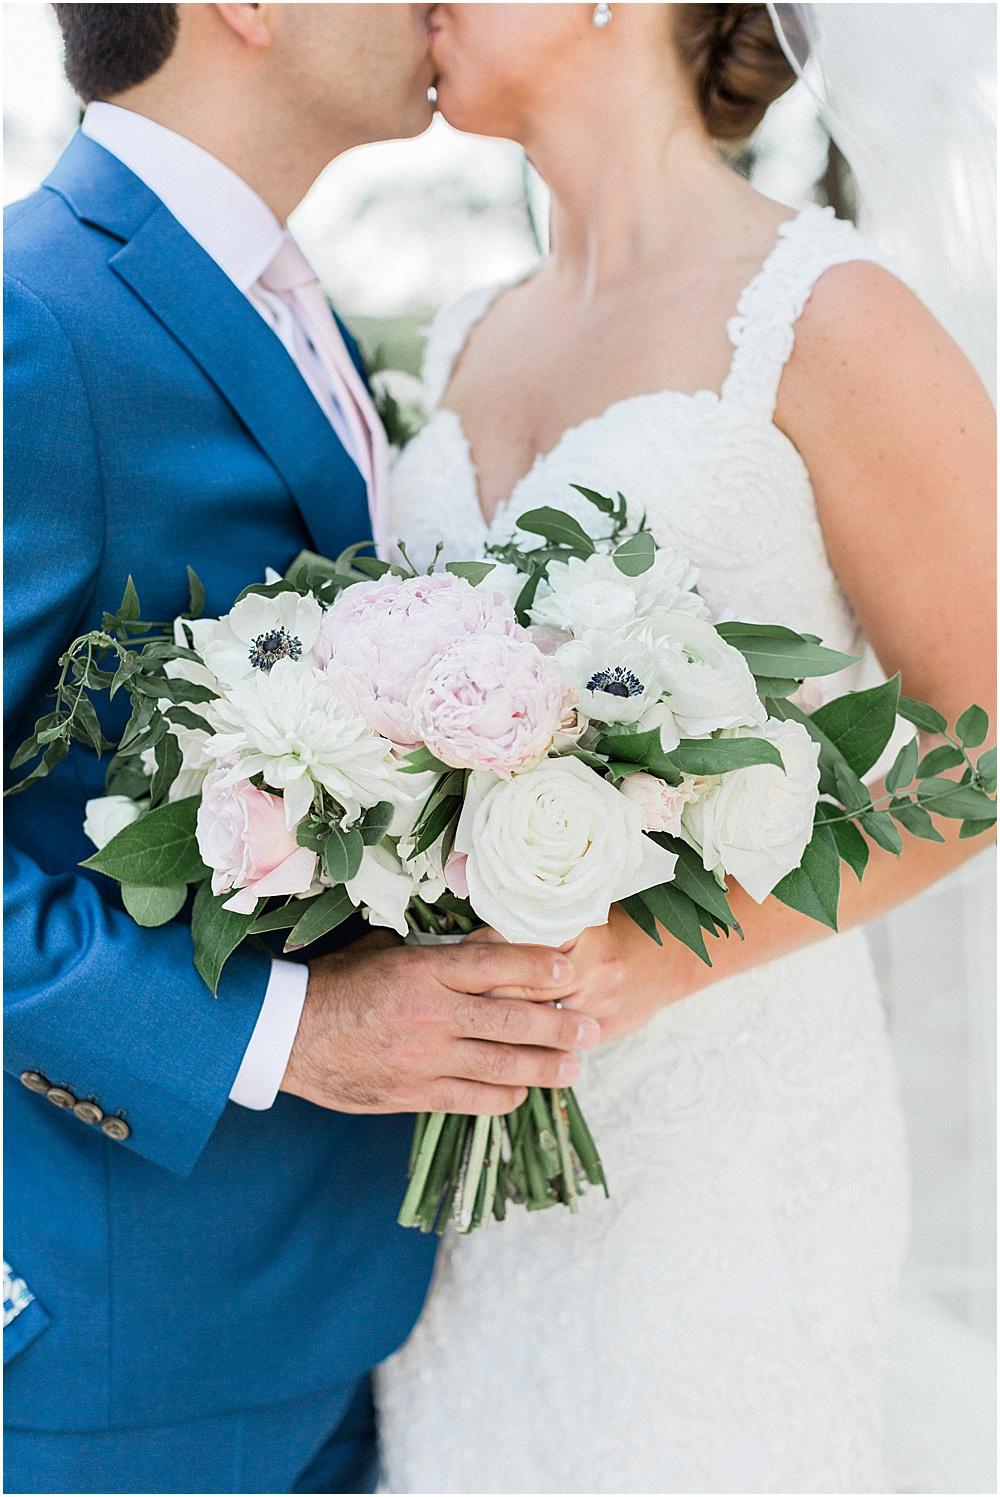 willowbend_country_club_colleen_brett_wild_dahlia_cw_events_cape_cod_massachusetts_boston_wedding_photographer_meredith_jane_photography_photo_0578.jpg